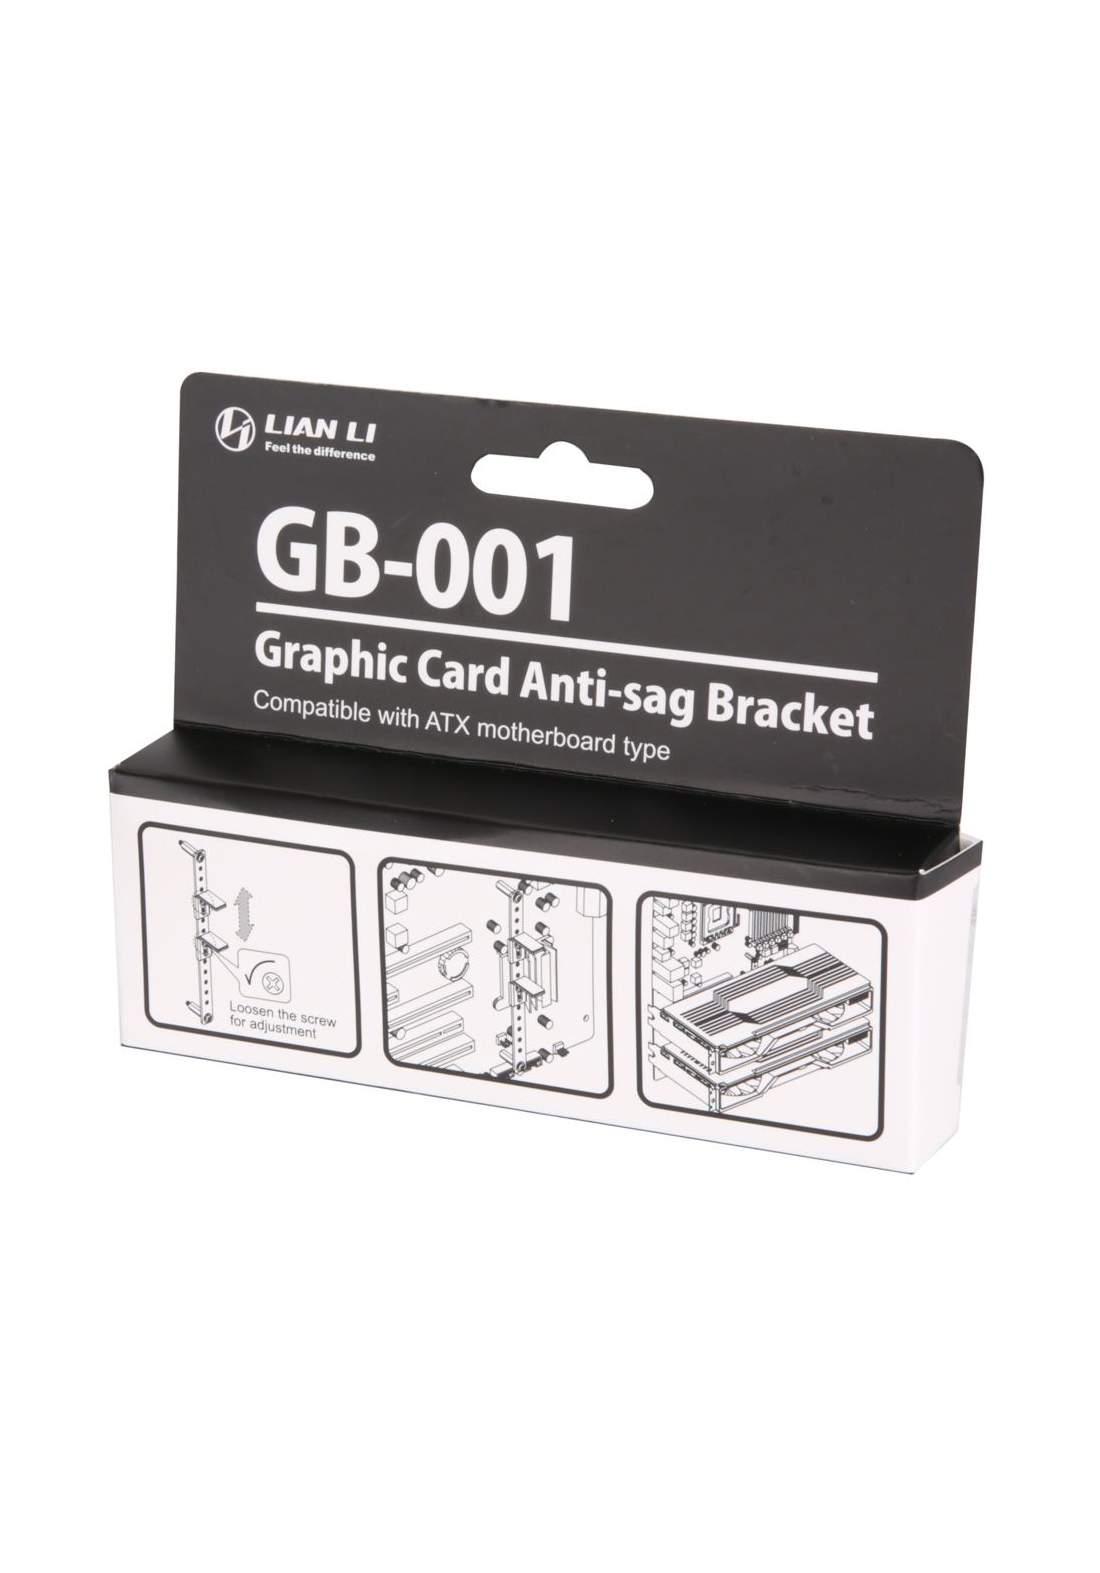 Lian-Li GB-001 Anti Sag Bracket for VGA Cards - Black حامل مضاد لتمدد البطاقات